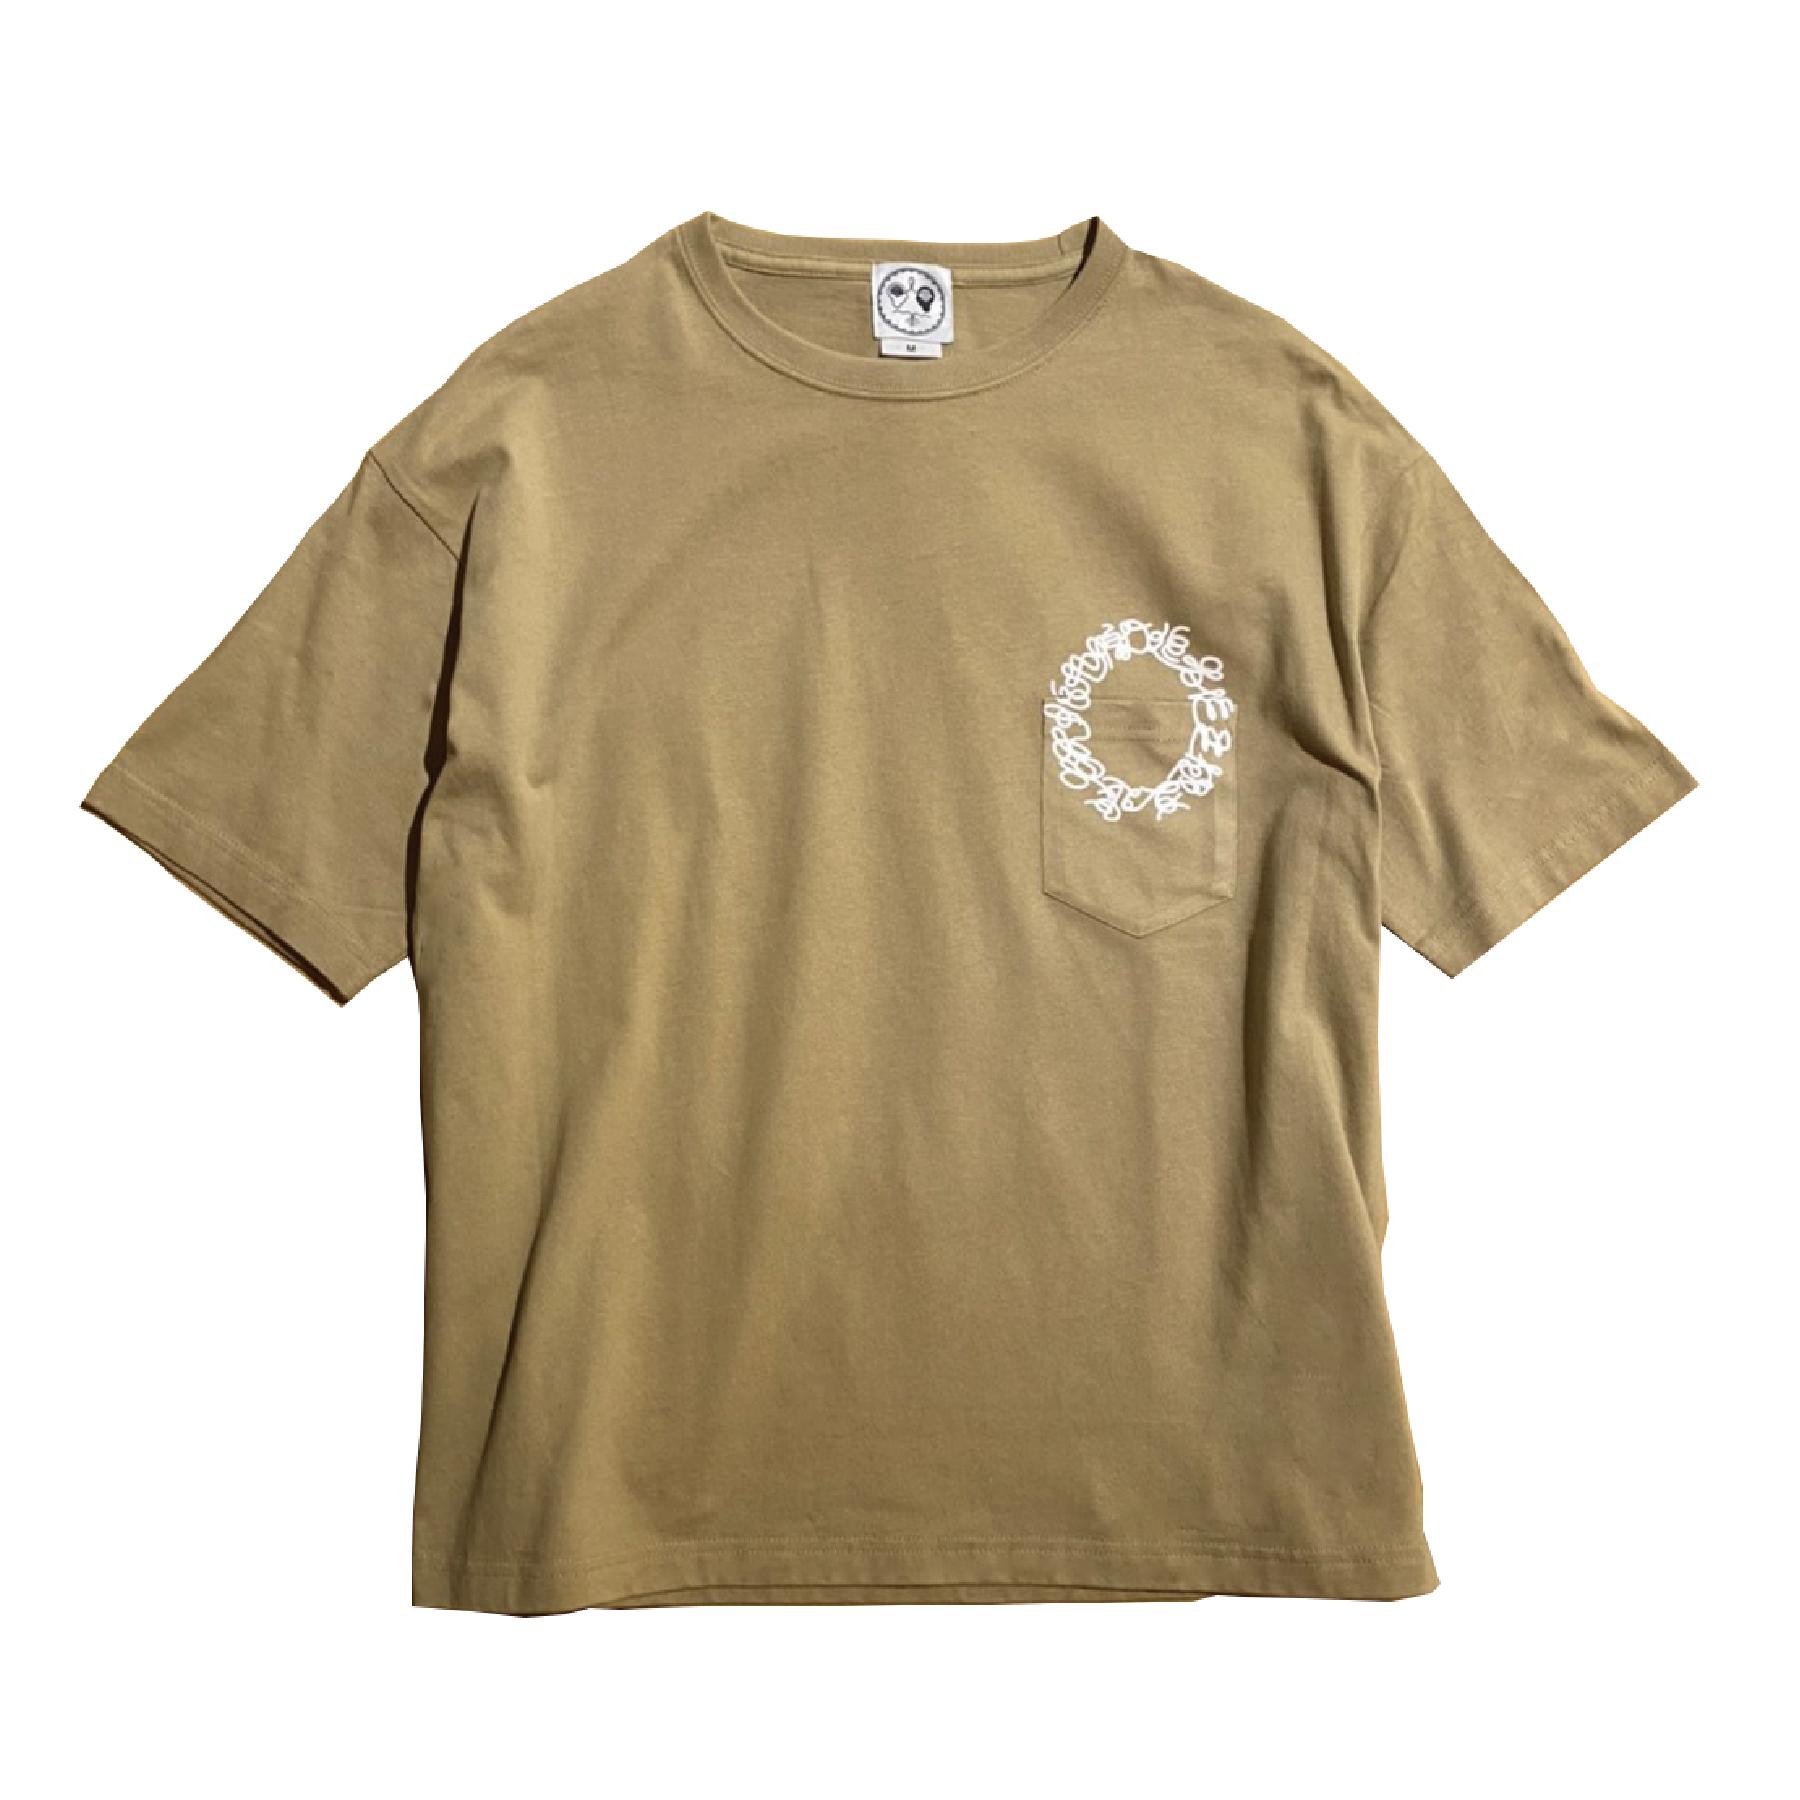 "SATOSHI MURAI × A.N.D.   ""BLESS YOU"" S/S Tshirts"